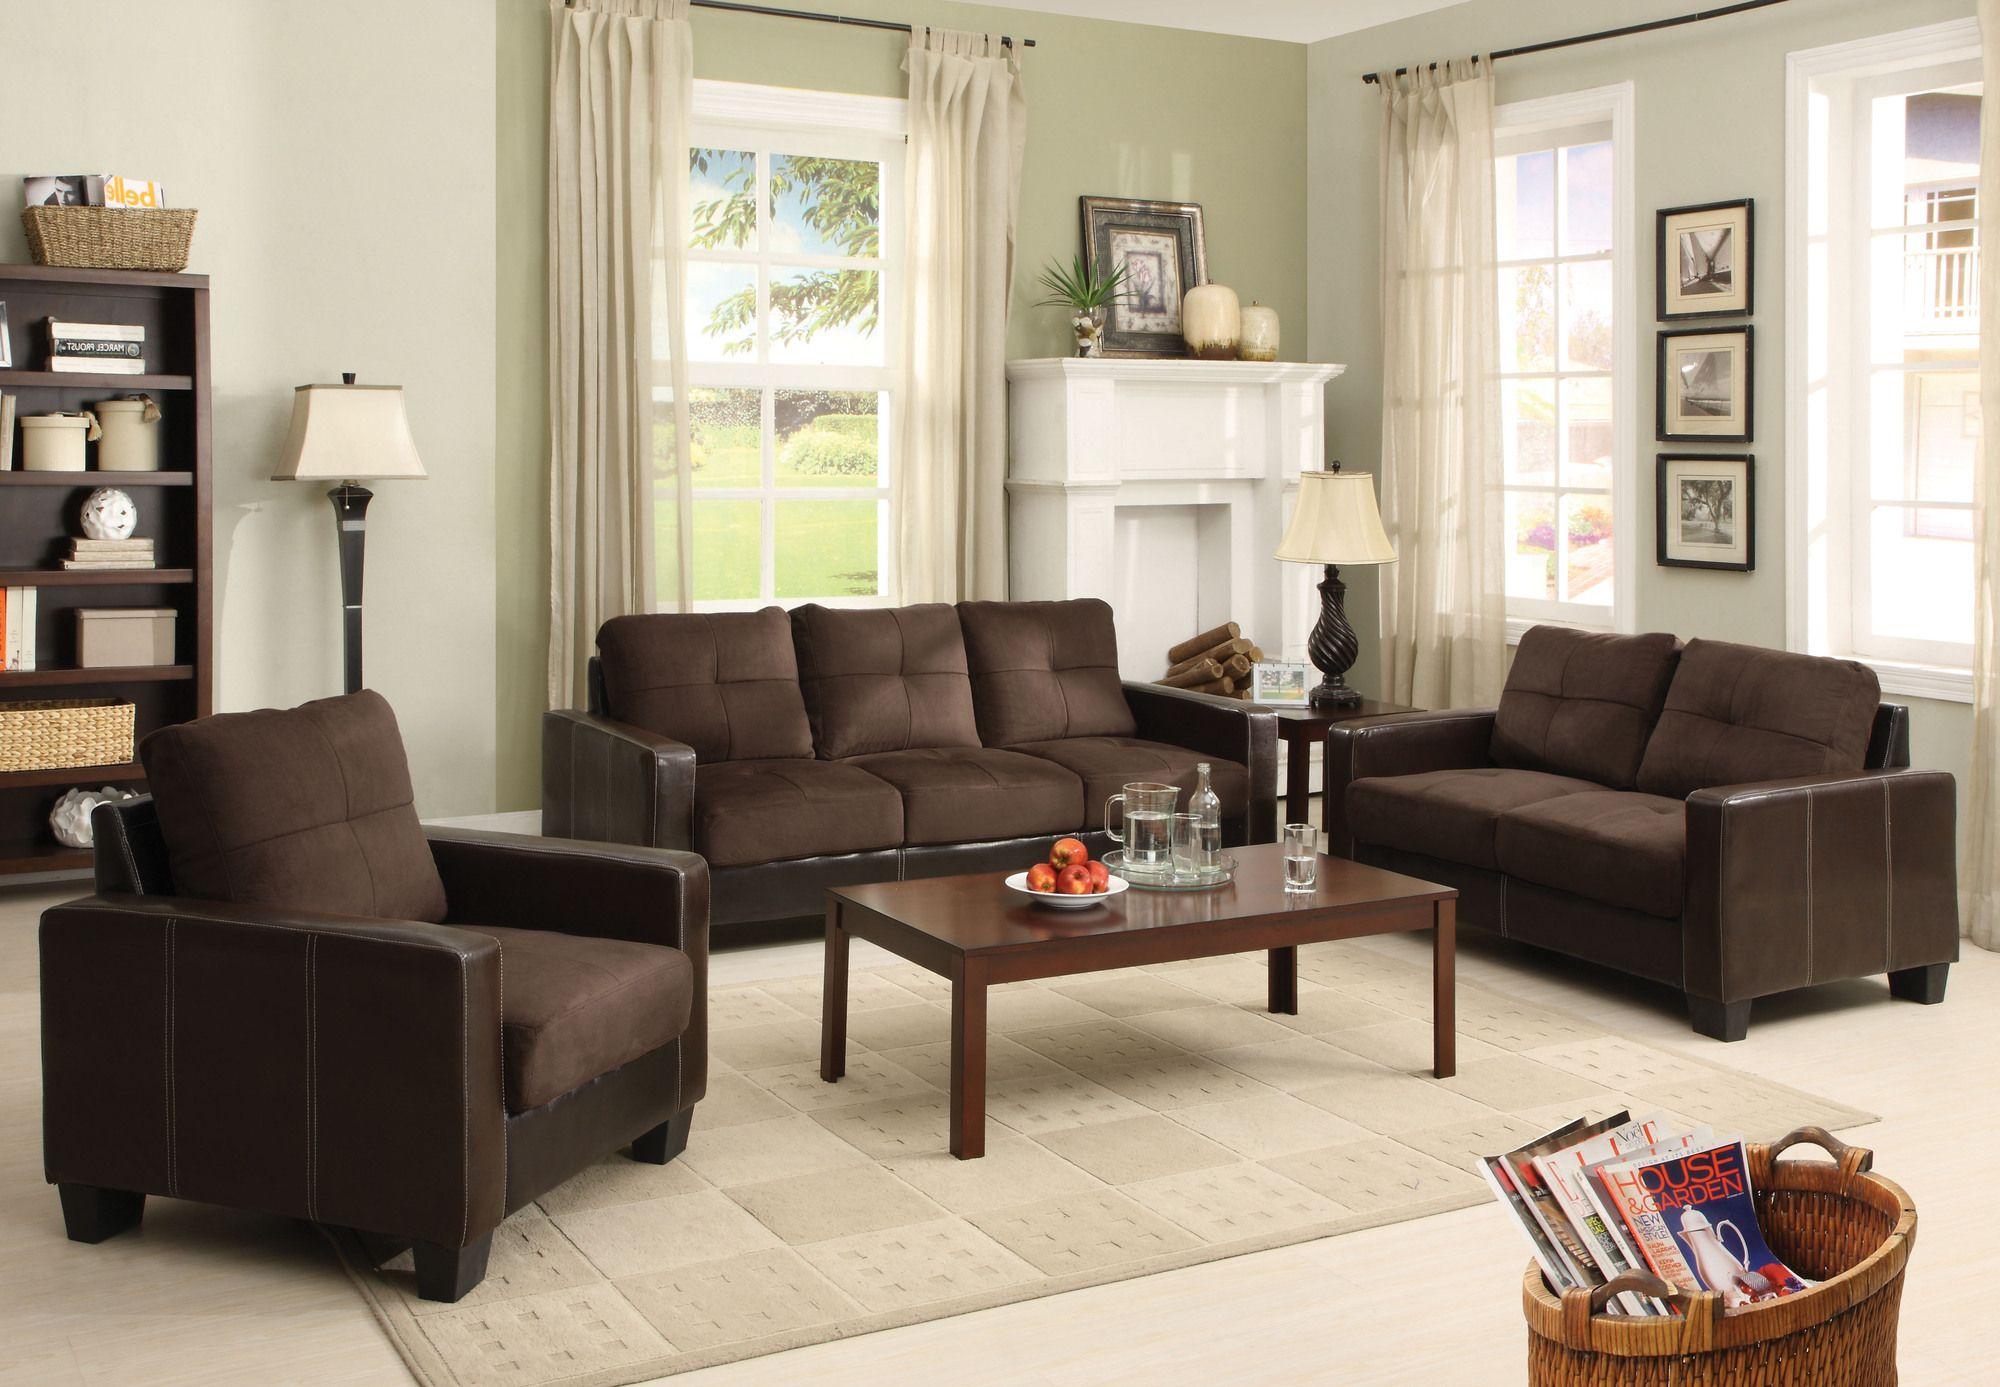 Hokku Designs Townsend Microfiber 3 Piece Living Room Set in